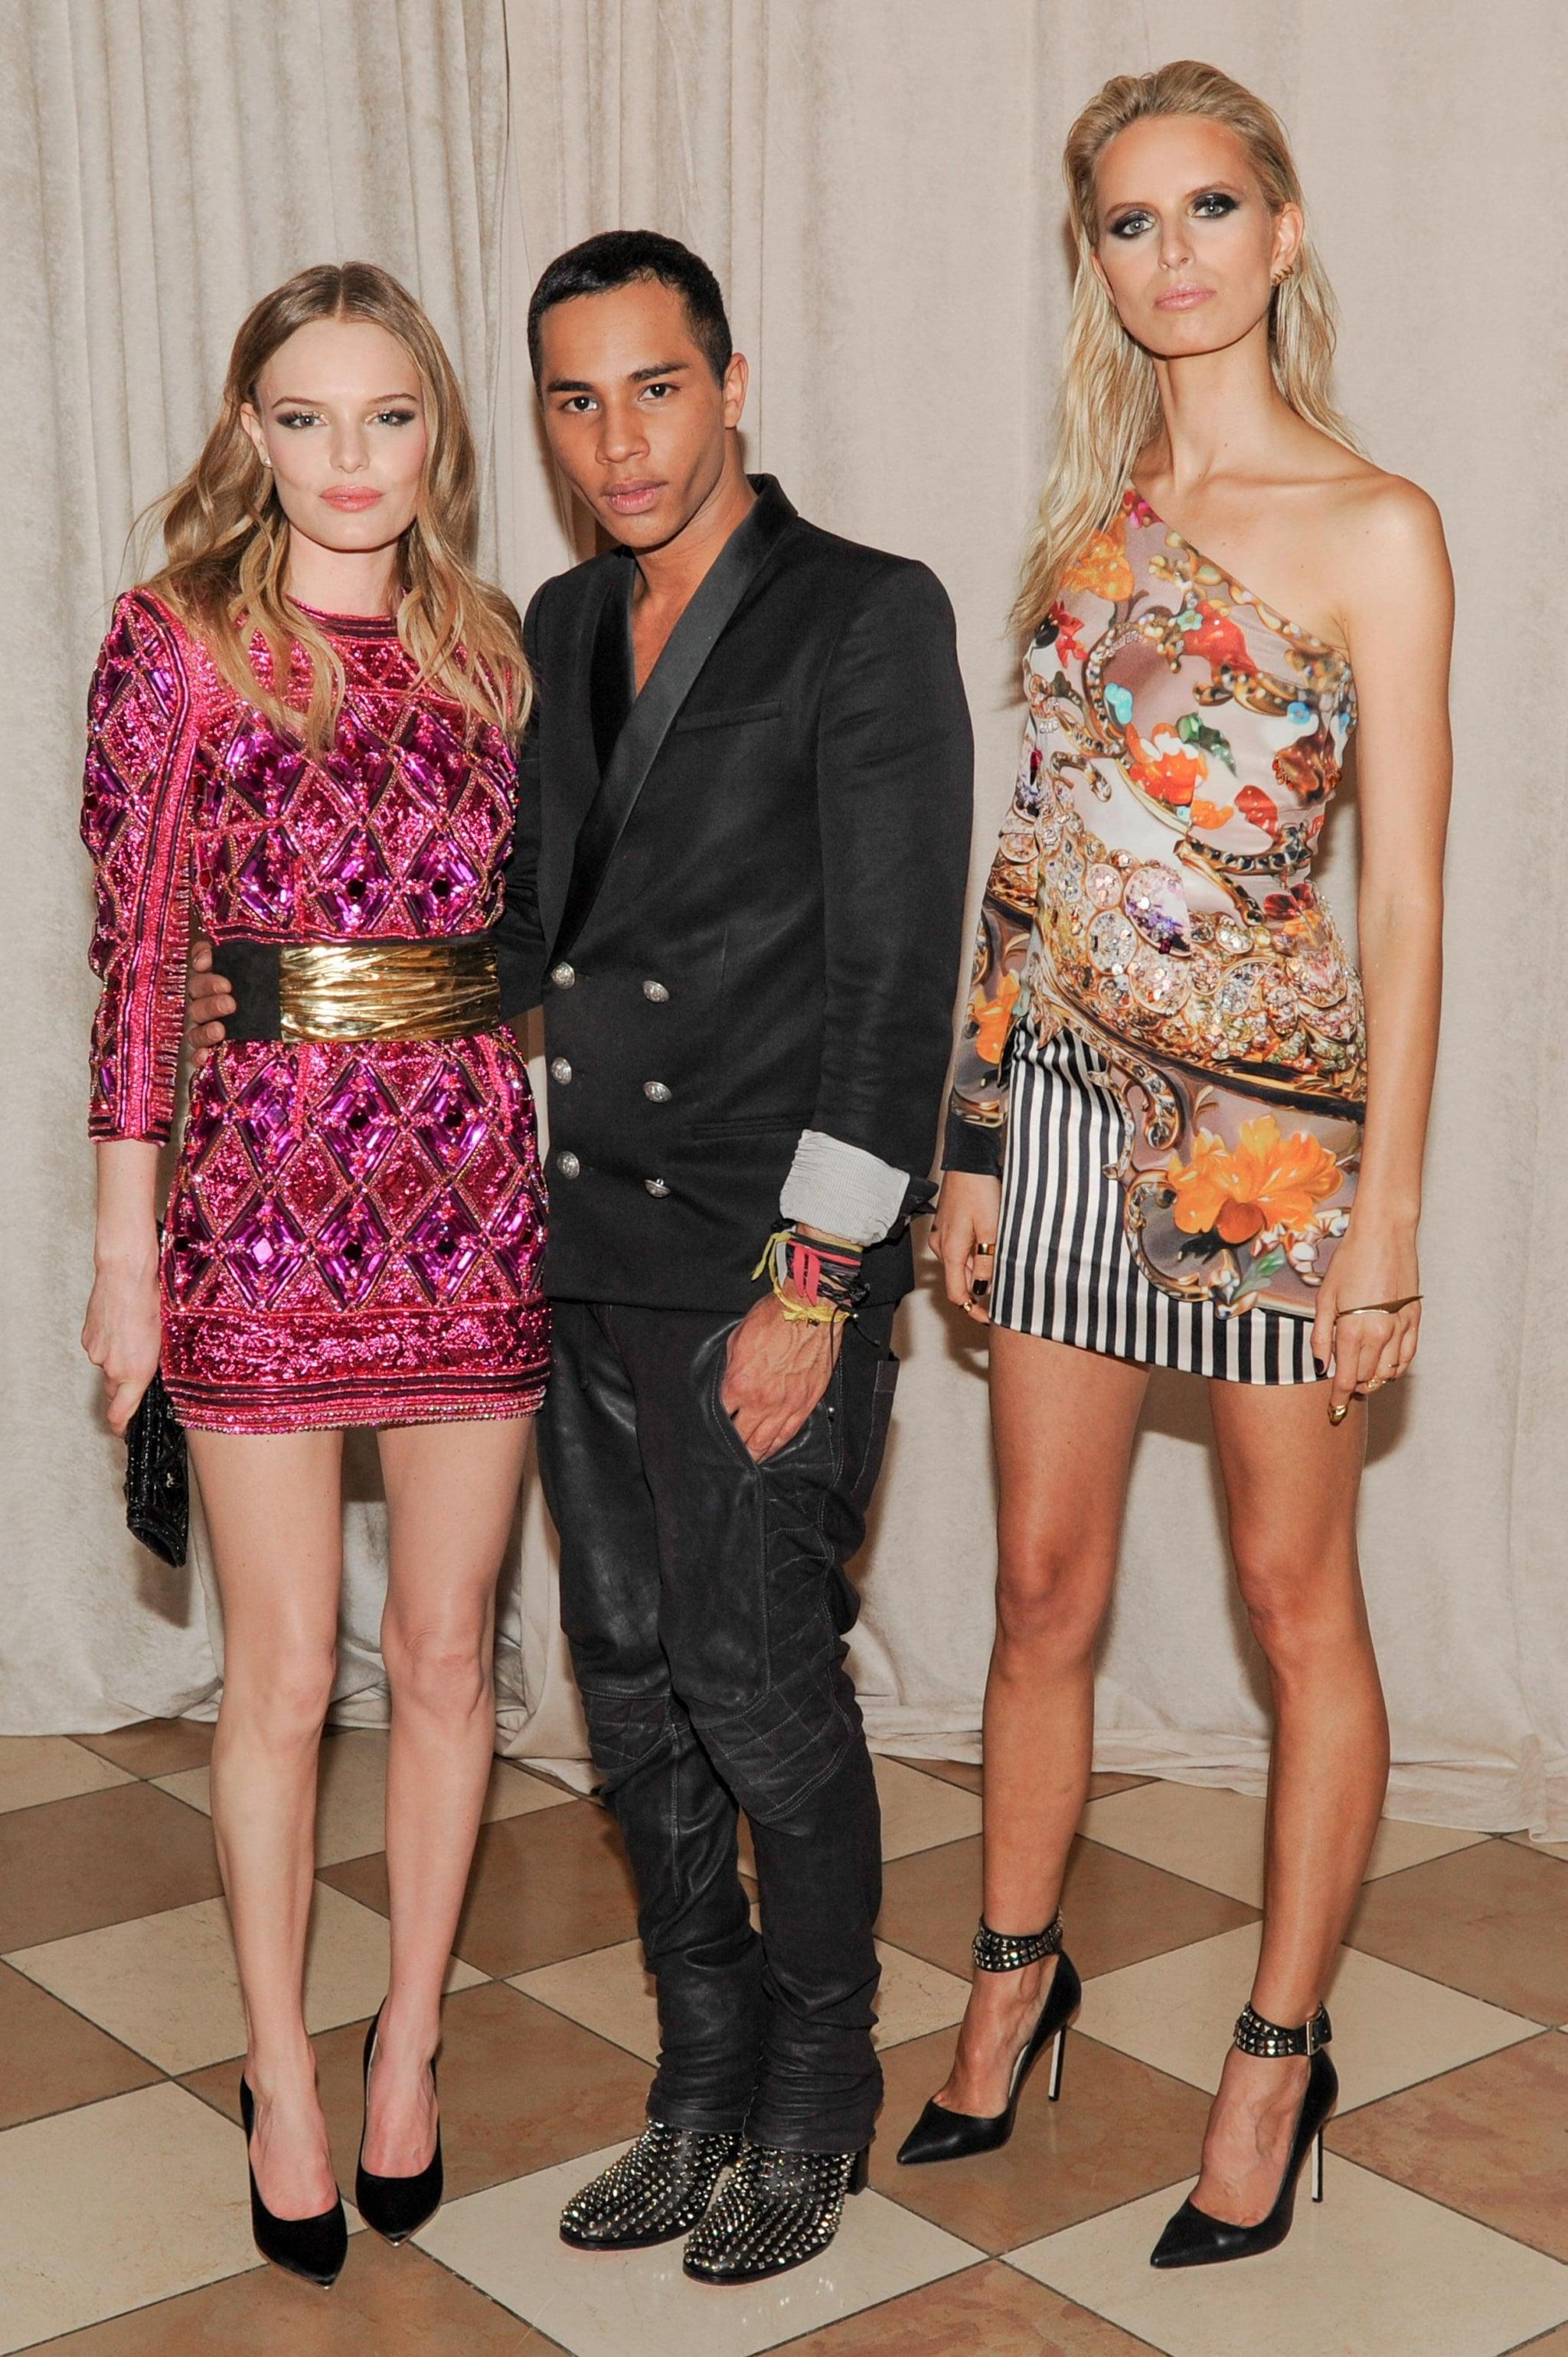 Kate Bosworth and Karolina Kurkova joined designer Olivier Rousteing inside the Met Gala.  Source: Billy Farrell/BFANYC.com